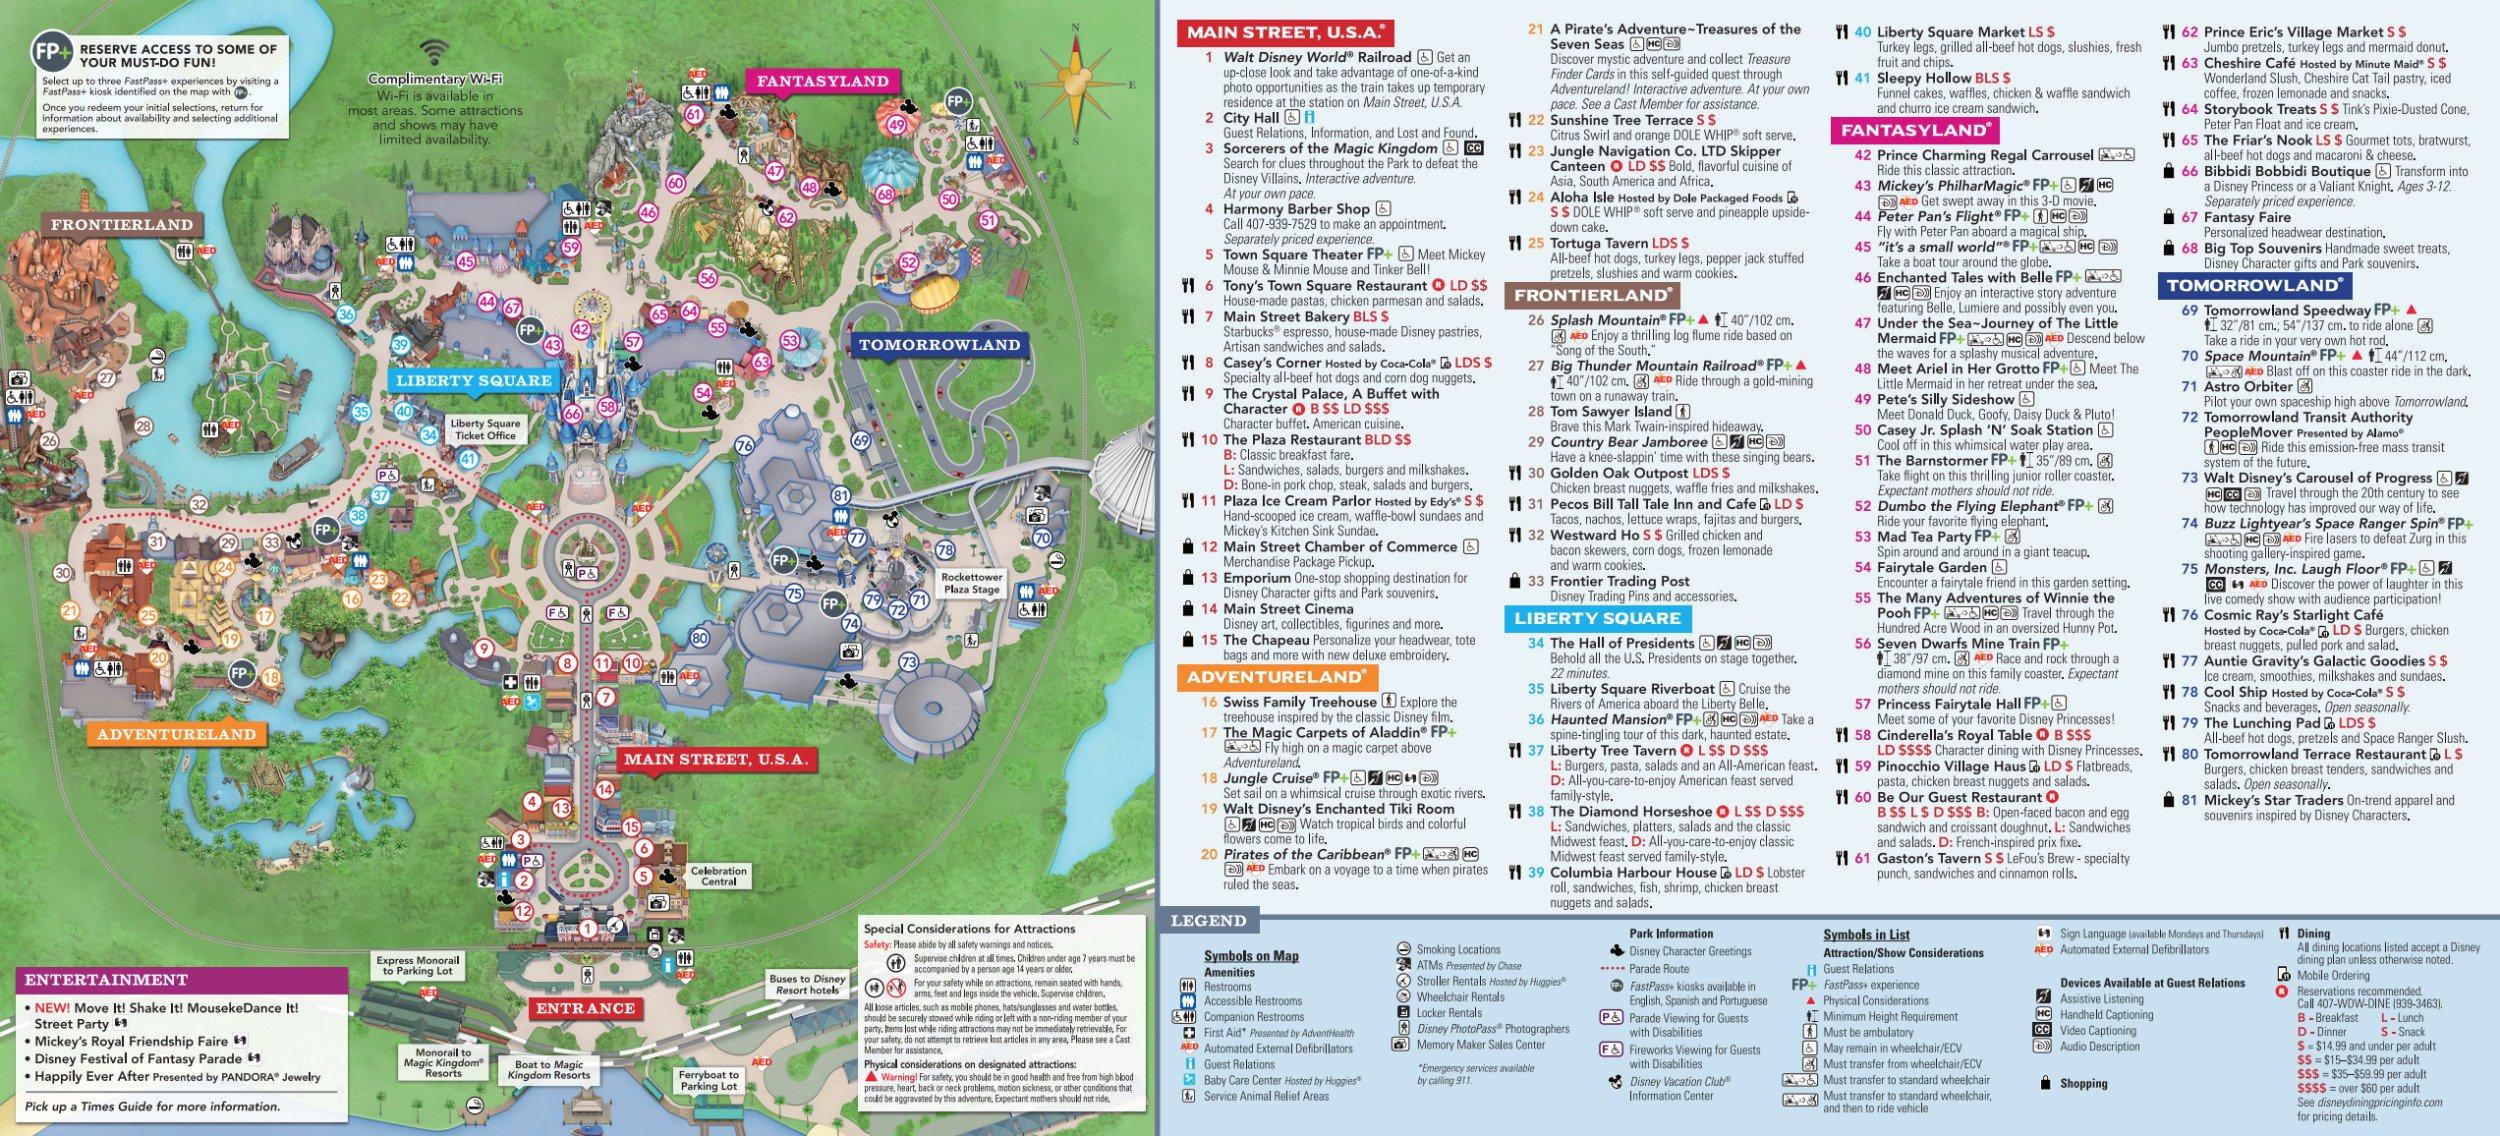 Magic Kingdom Park Map - Walt Disney World - Disney World Florida Map 2018